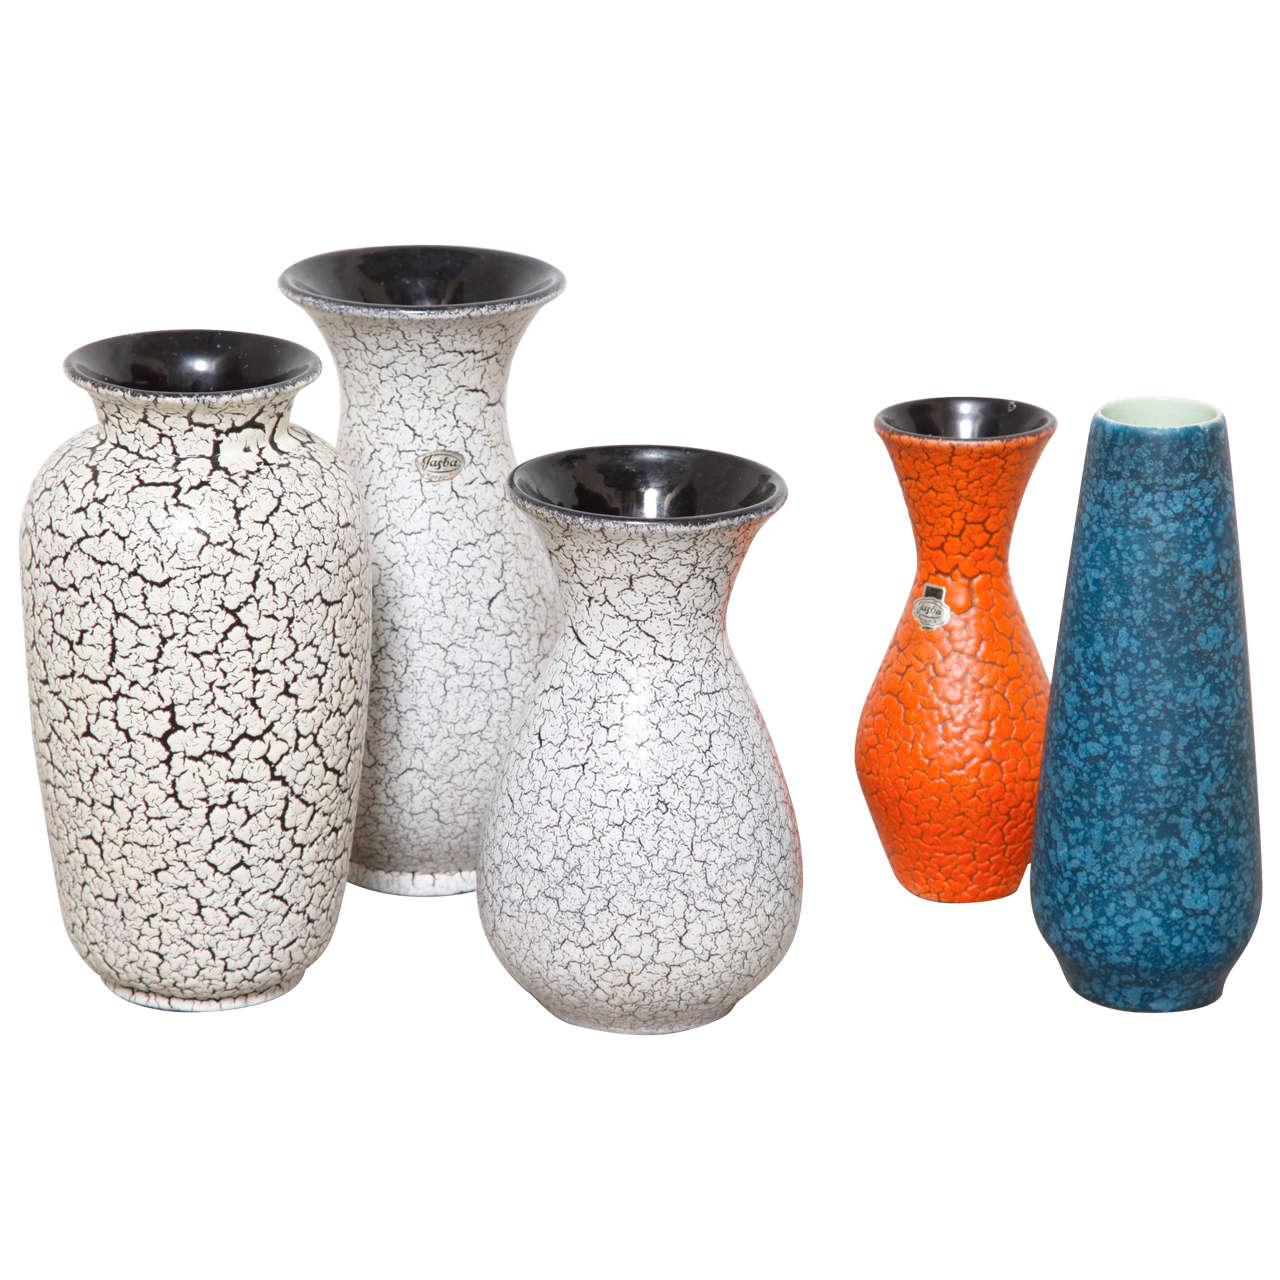 Group of Modernist Jasba Craquelé Ceramic Vases